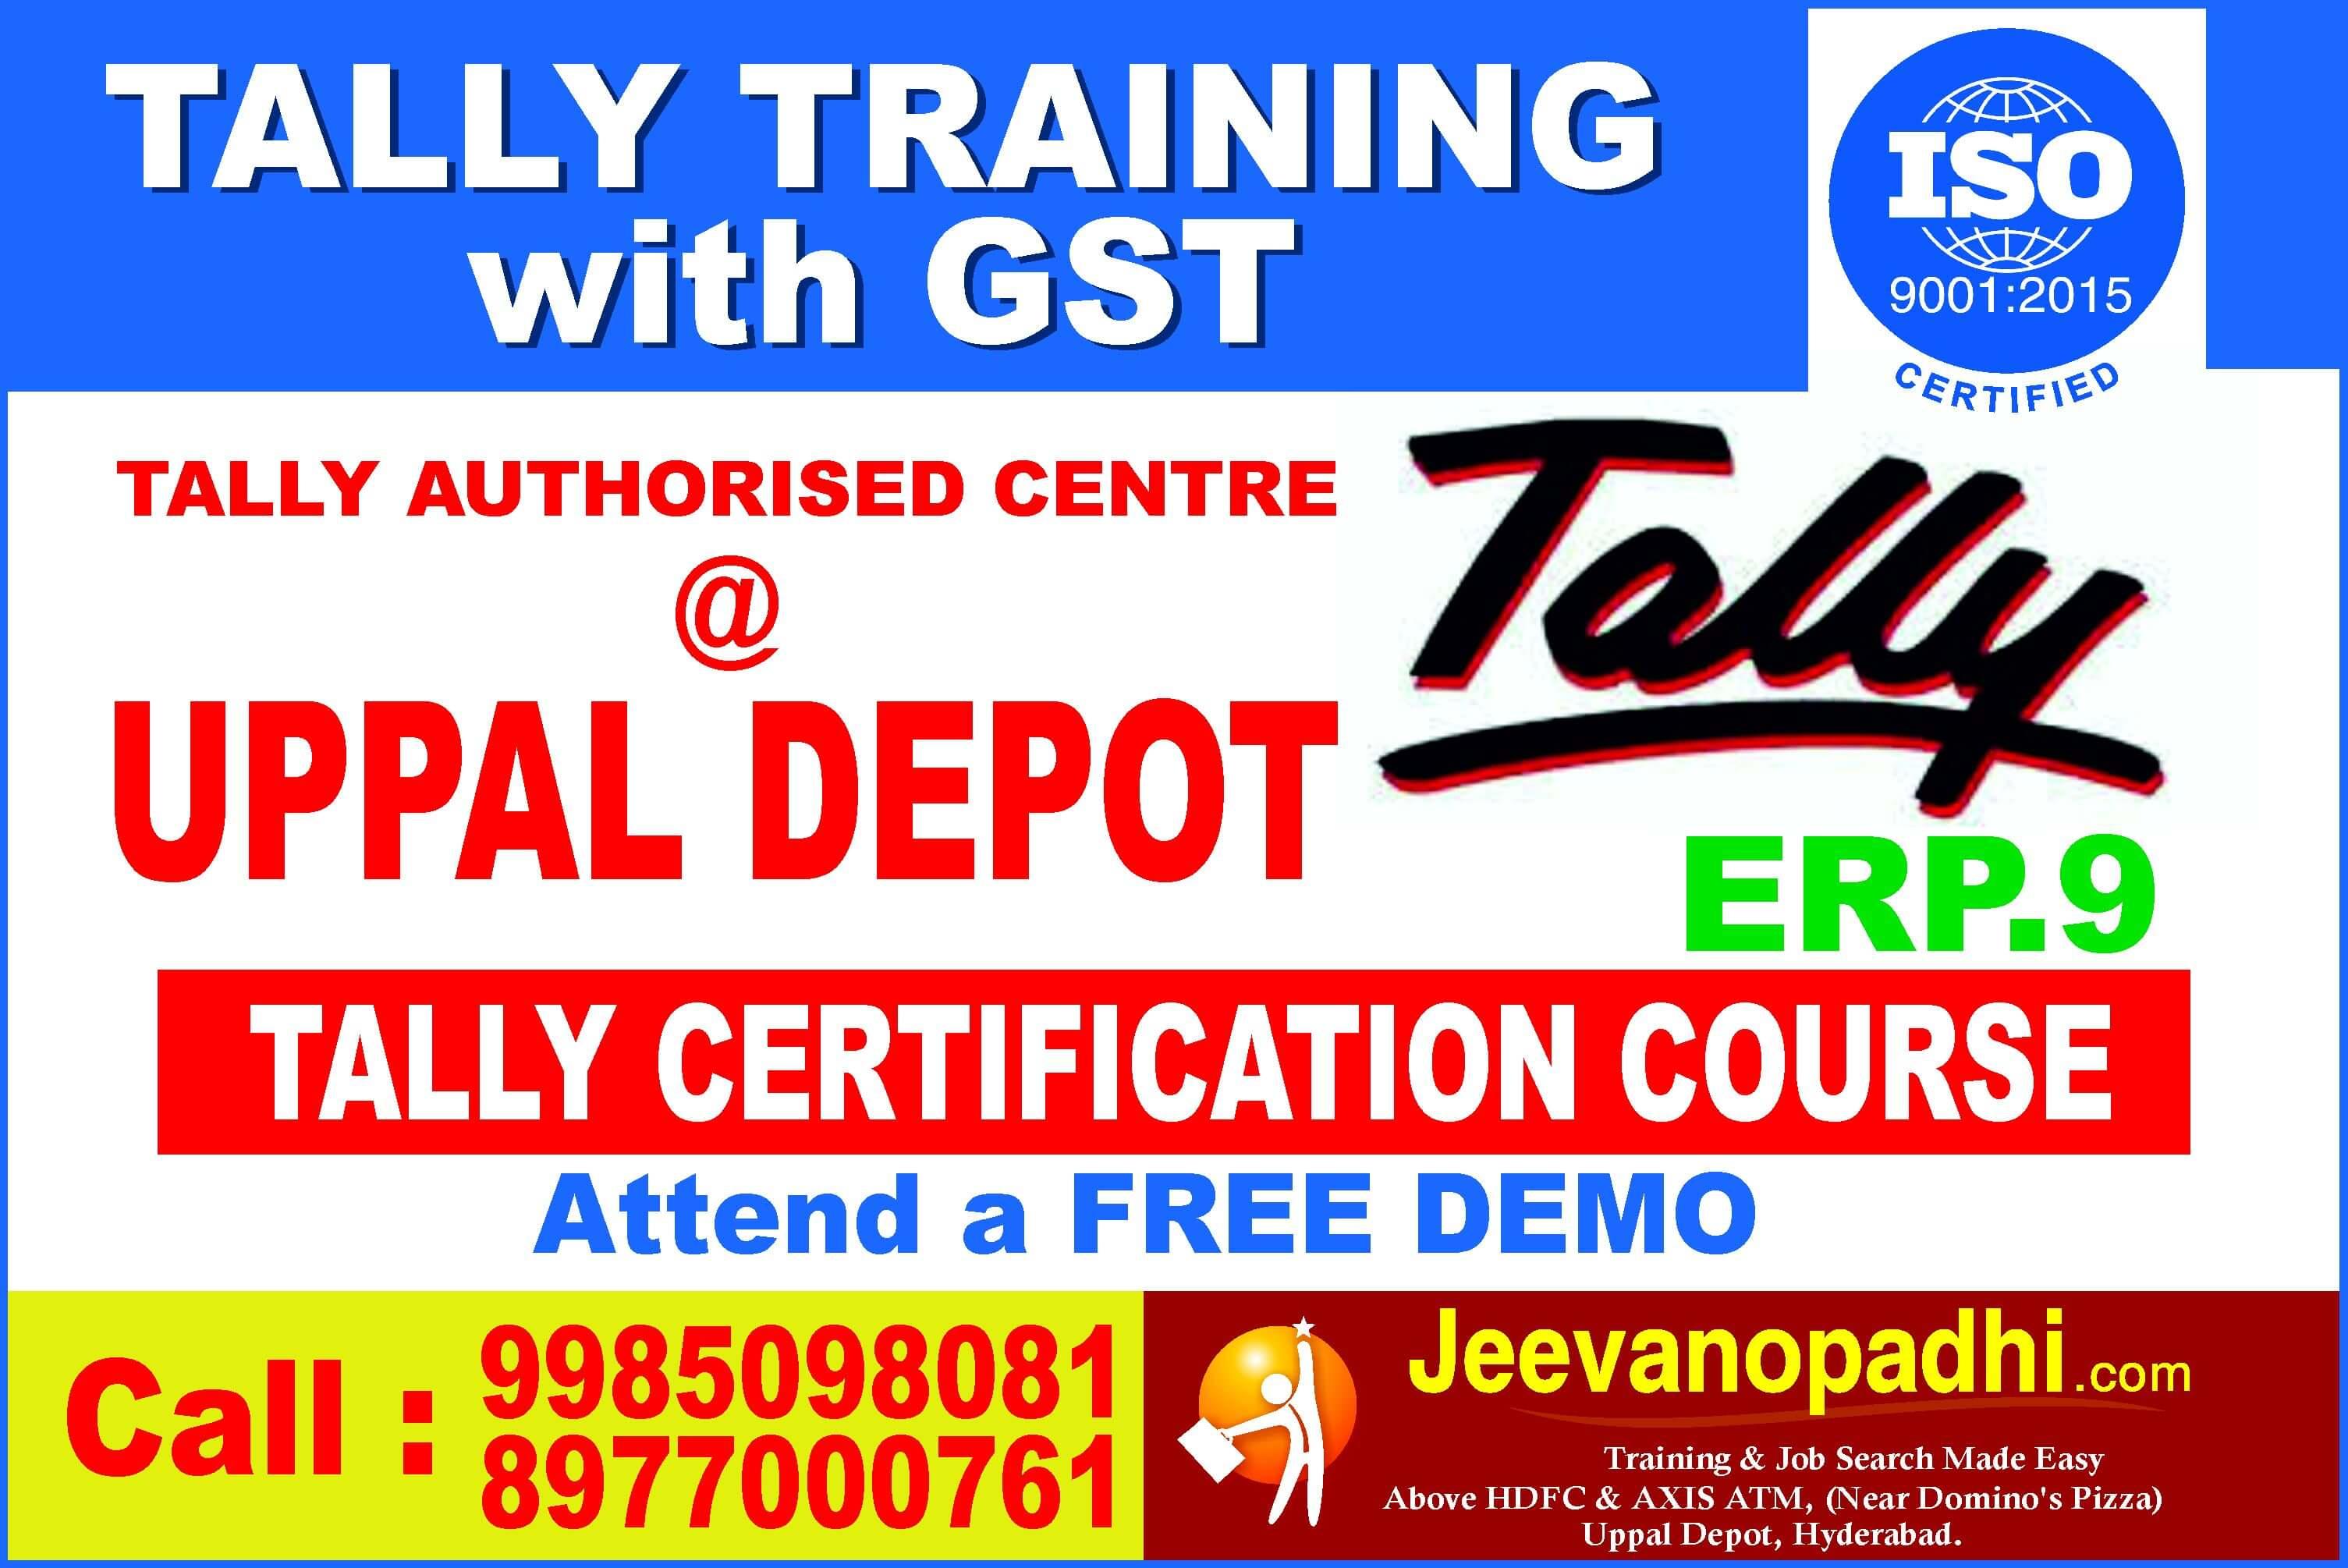 tally-at-uppal-jeevanopadhi